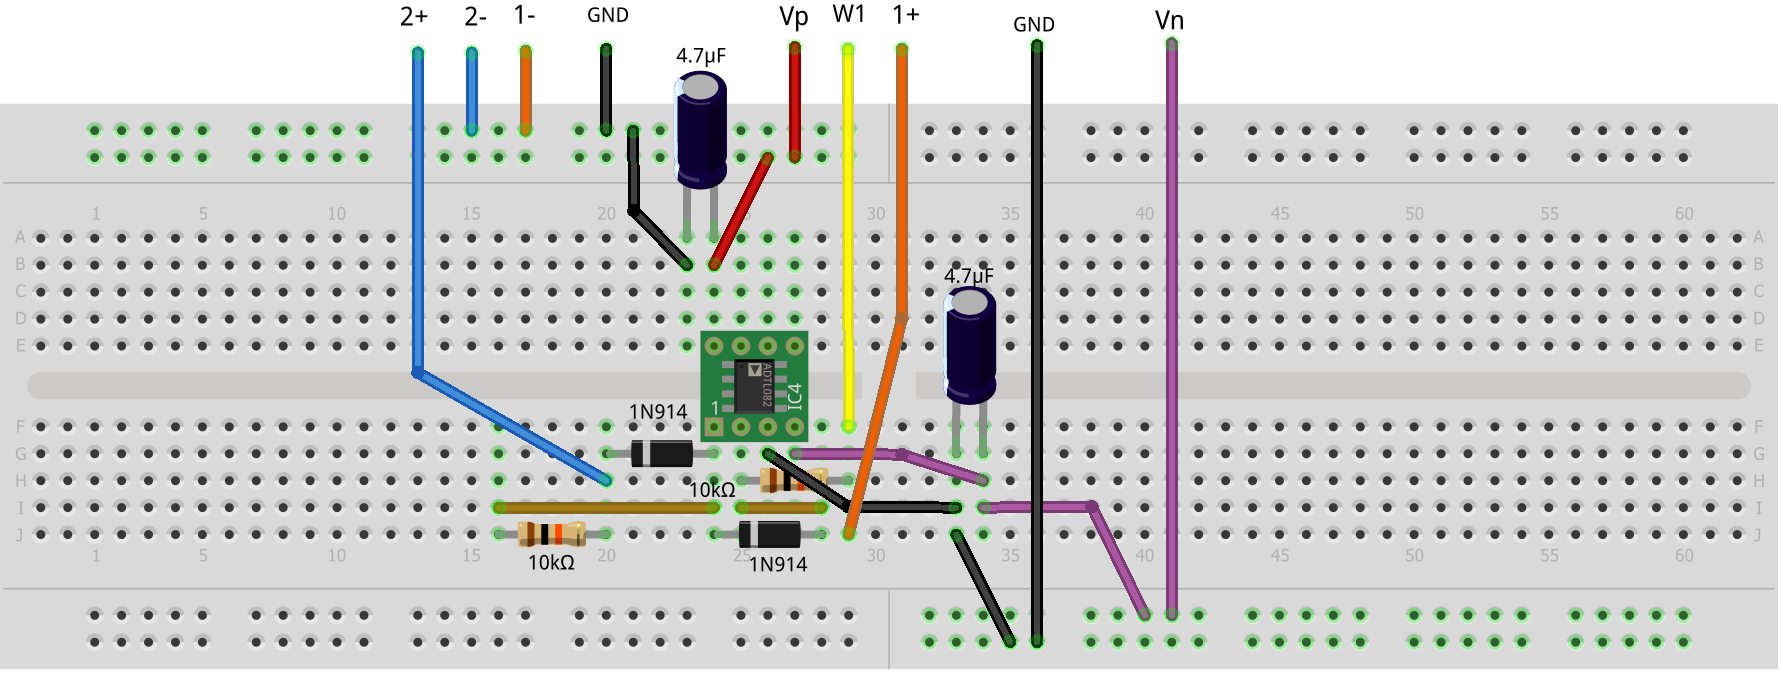 Activity 2 Diode I Vs V Curves Analog Devices Wiki Led Bias Circuit Dc Ac Leds Analyze And Design With Hardware Setup